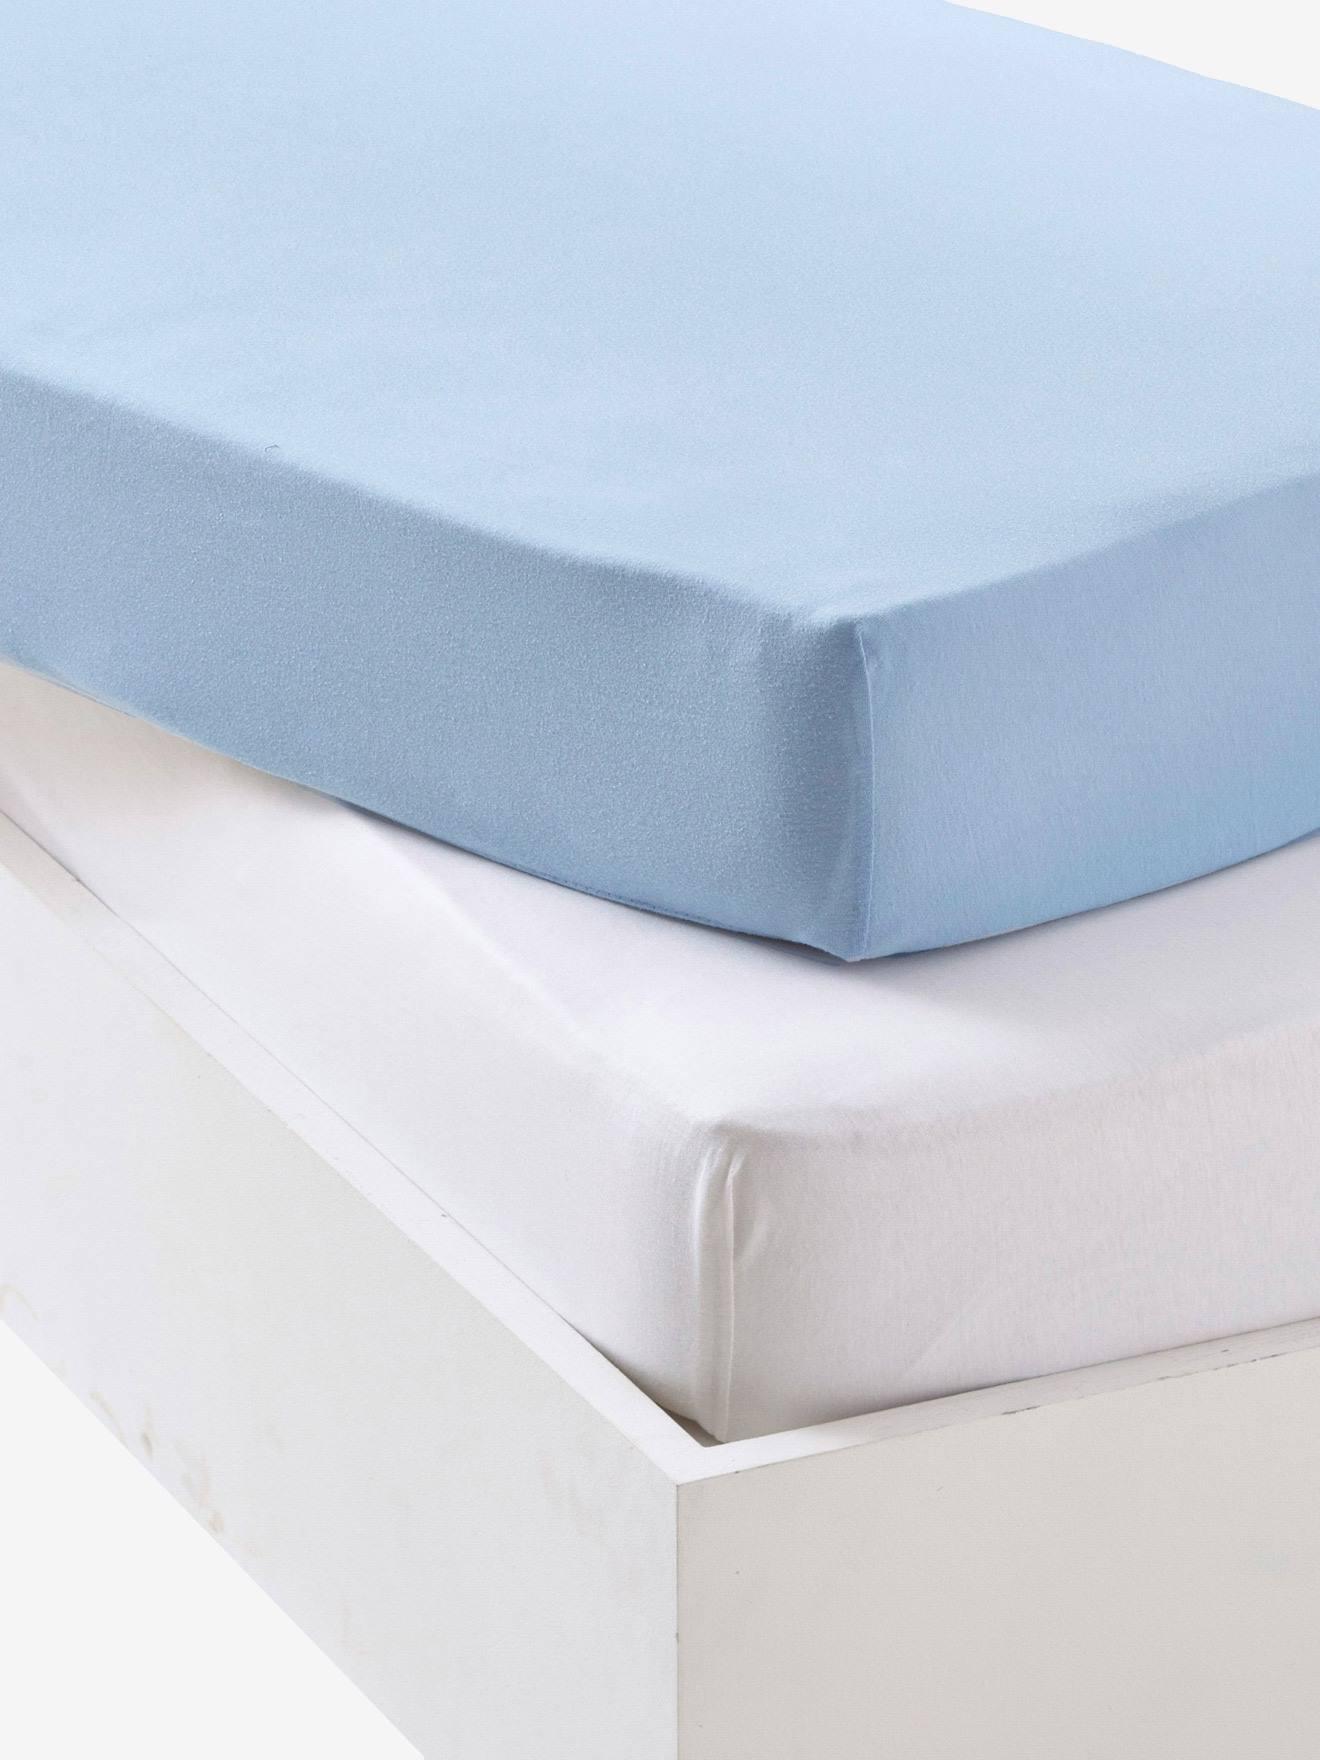 1 azul 2 s/ábanas bajeras ajustables para beb/é Chicco Next2Me 100/% algod/ón 1 blanco